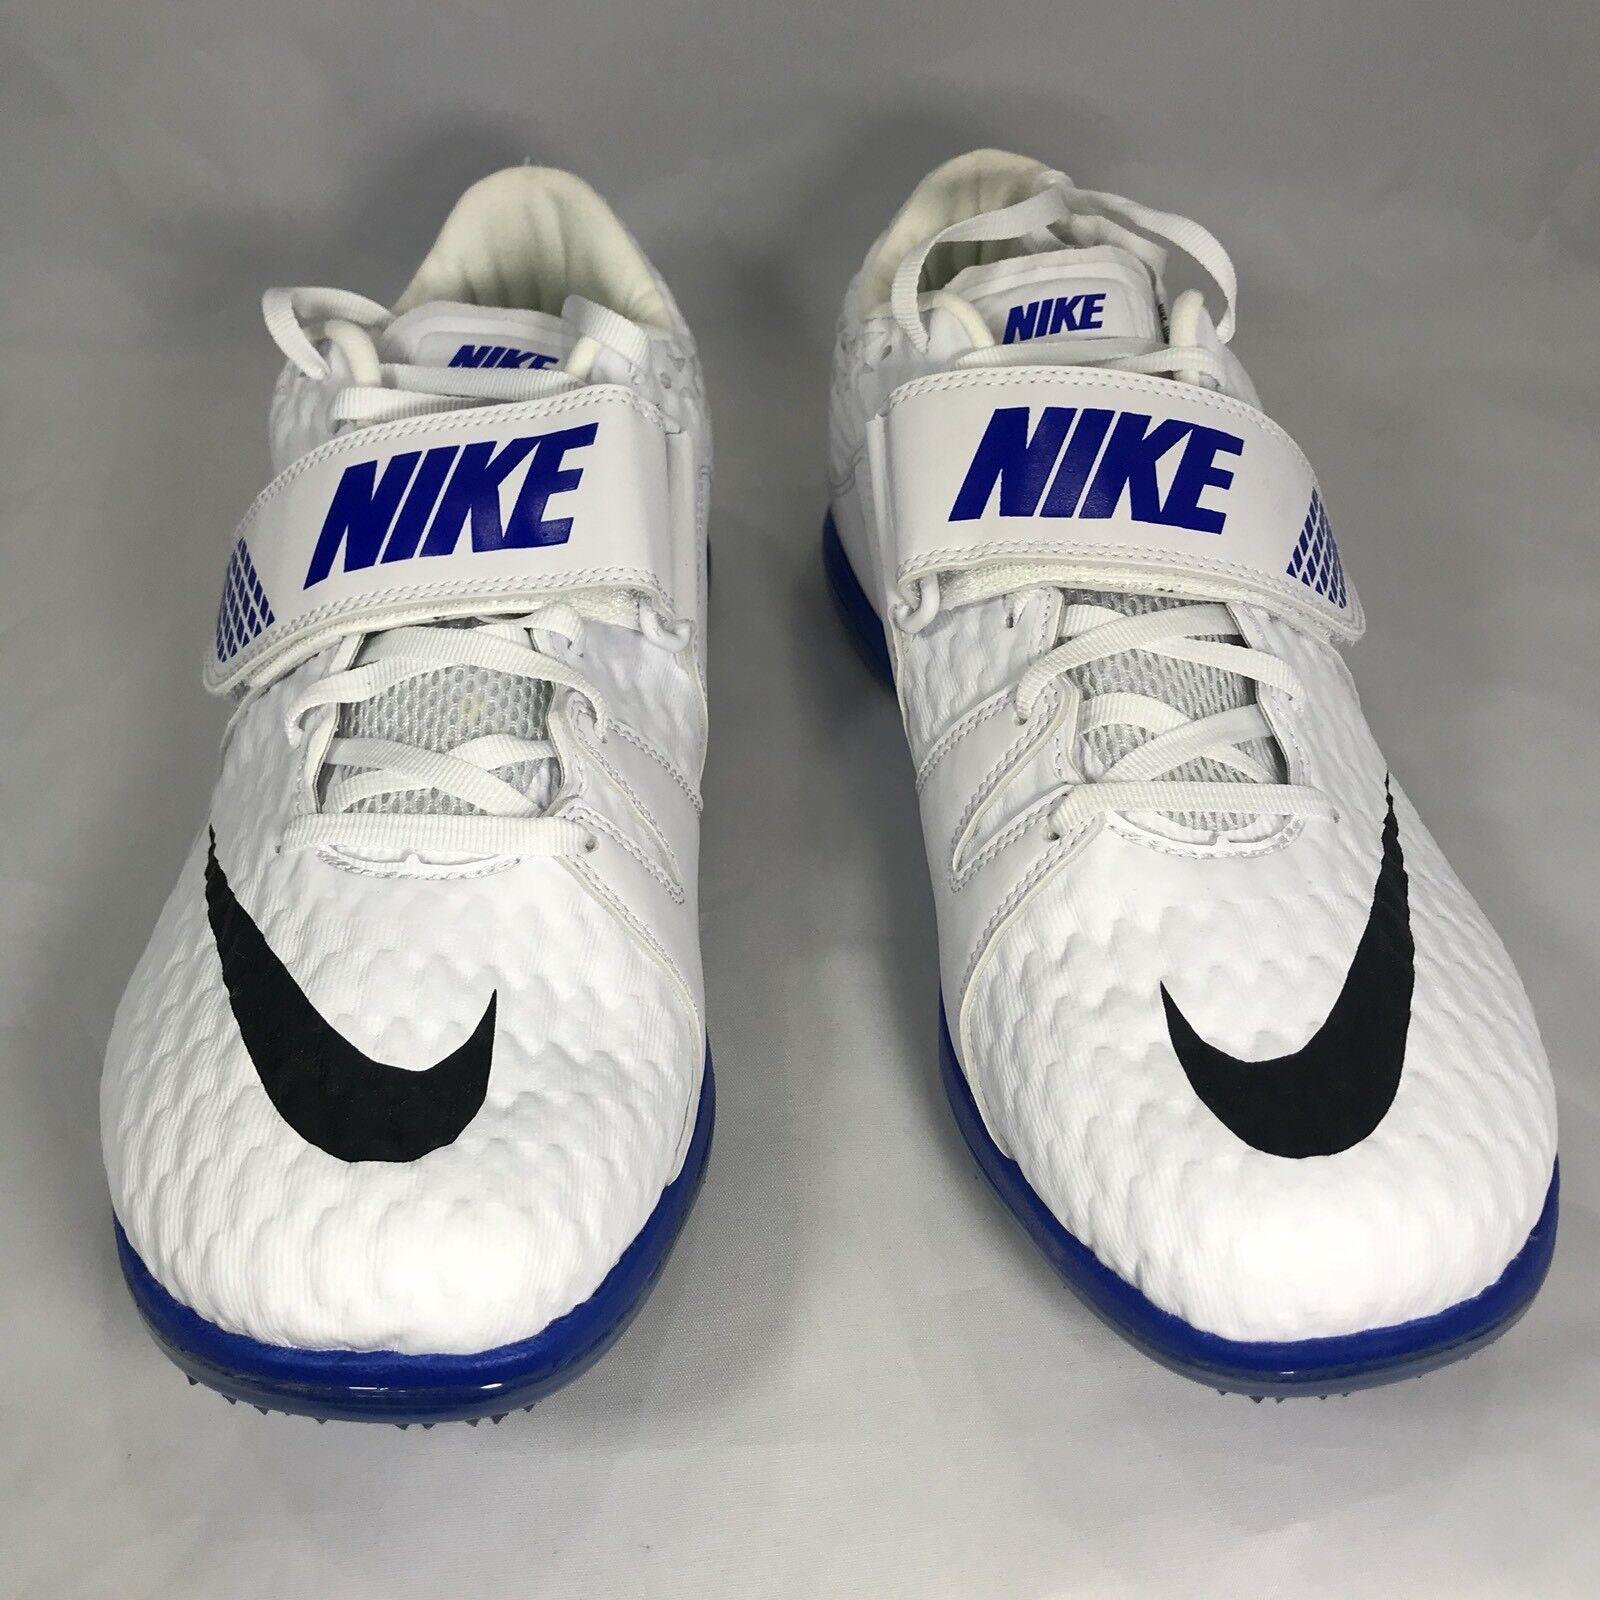 23 New Nike Mens HJ High Jump Elite White Track Spikes 806561-100